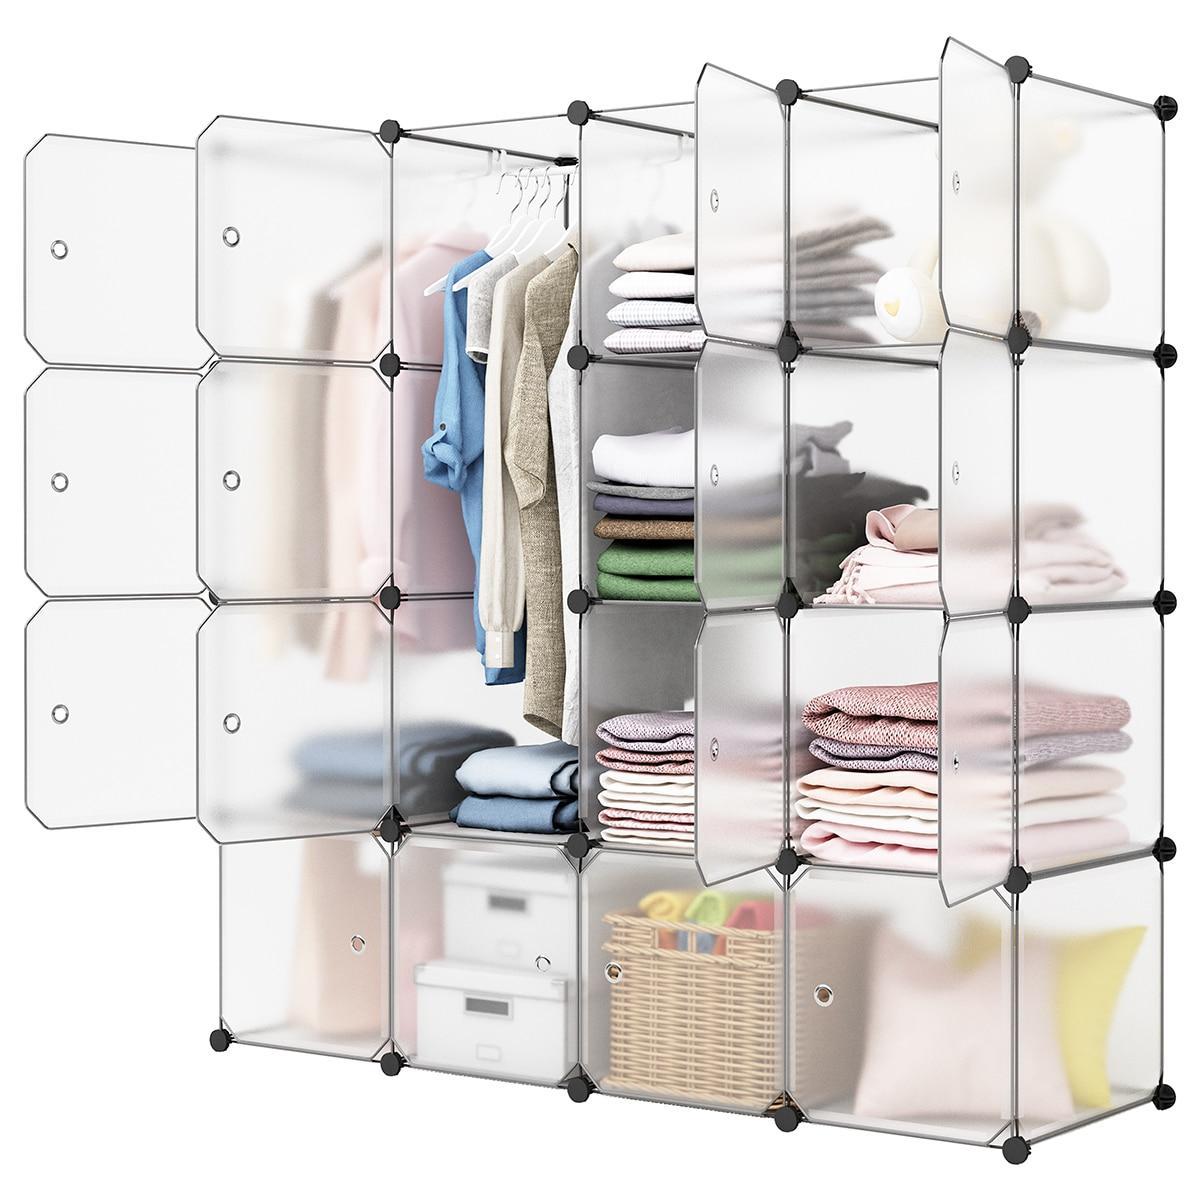 LANGRIA 16-Cube DIY Modular Organizer Modular Storage Organizer Shelving System Closet Wardrobe Rack Transparent(China)